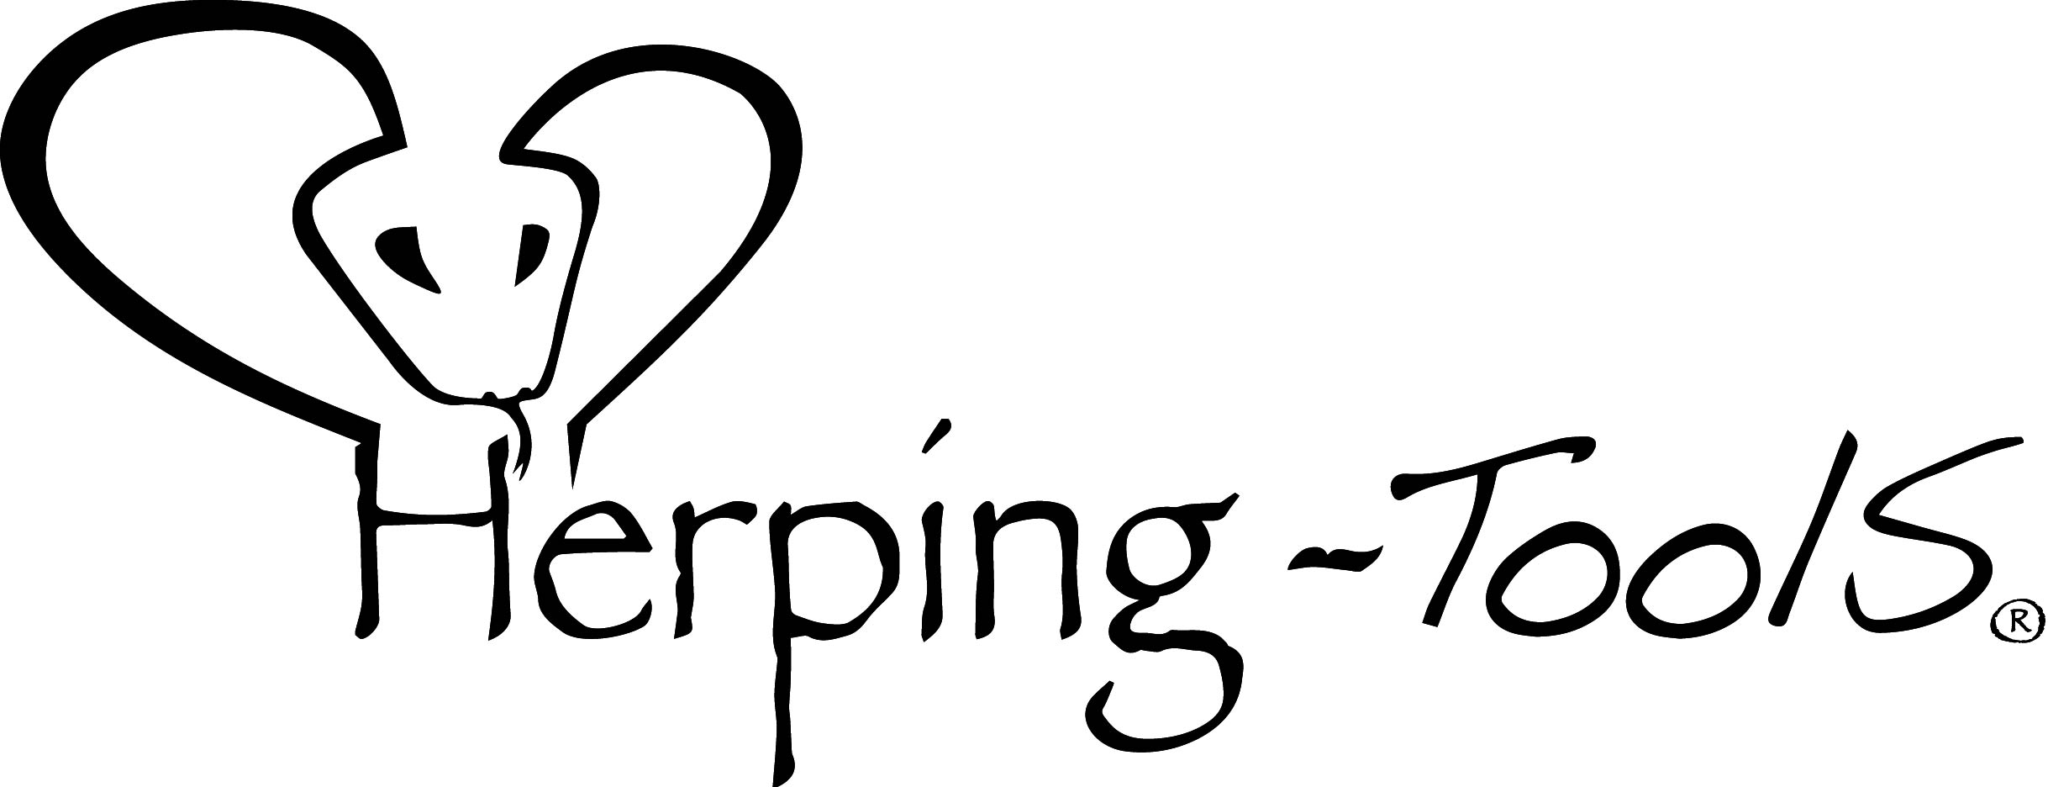 HERPING-TOOLS®